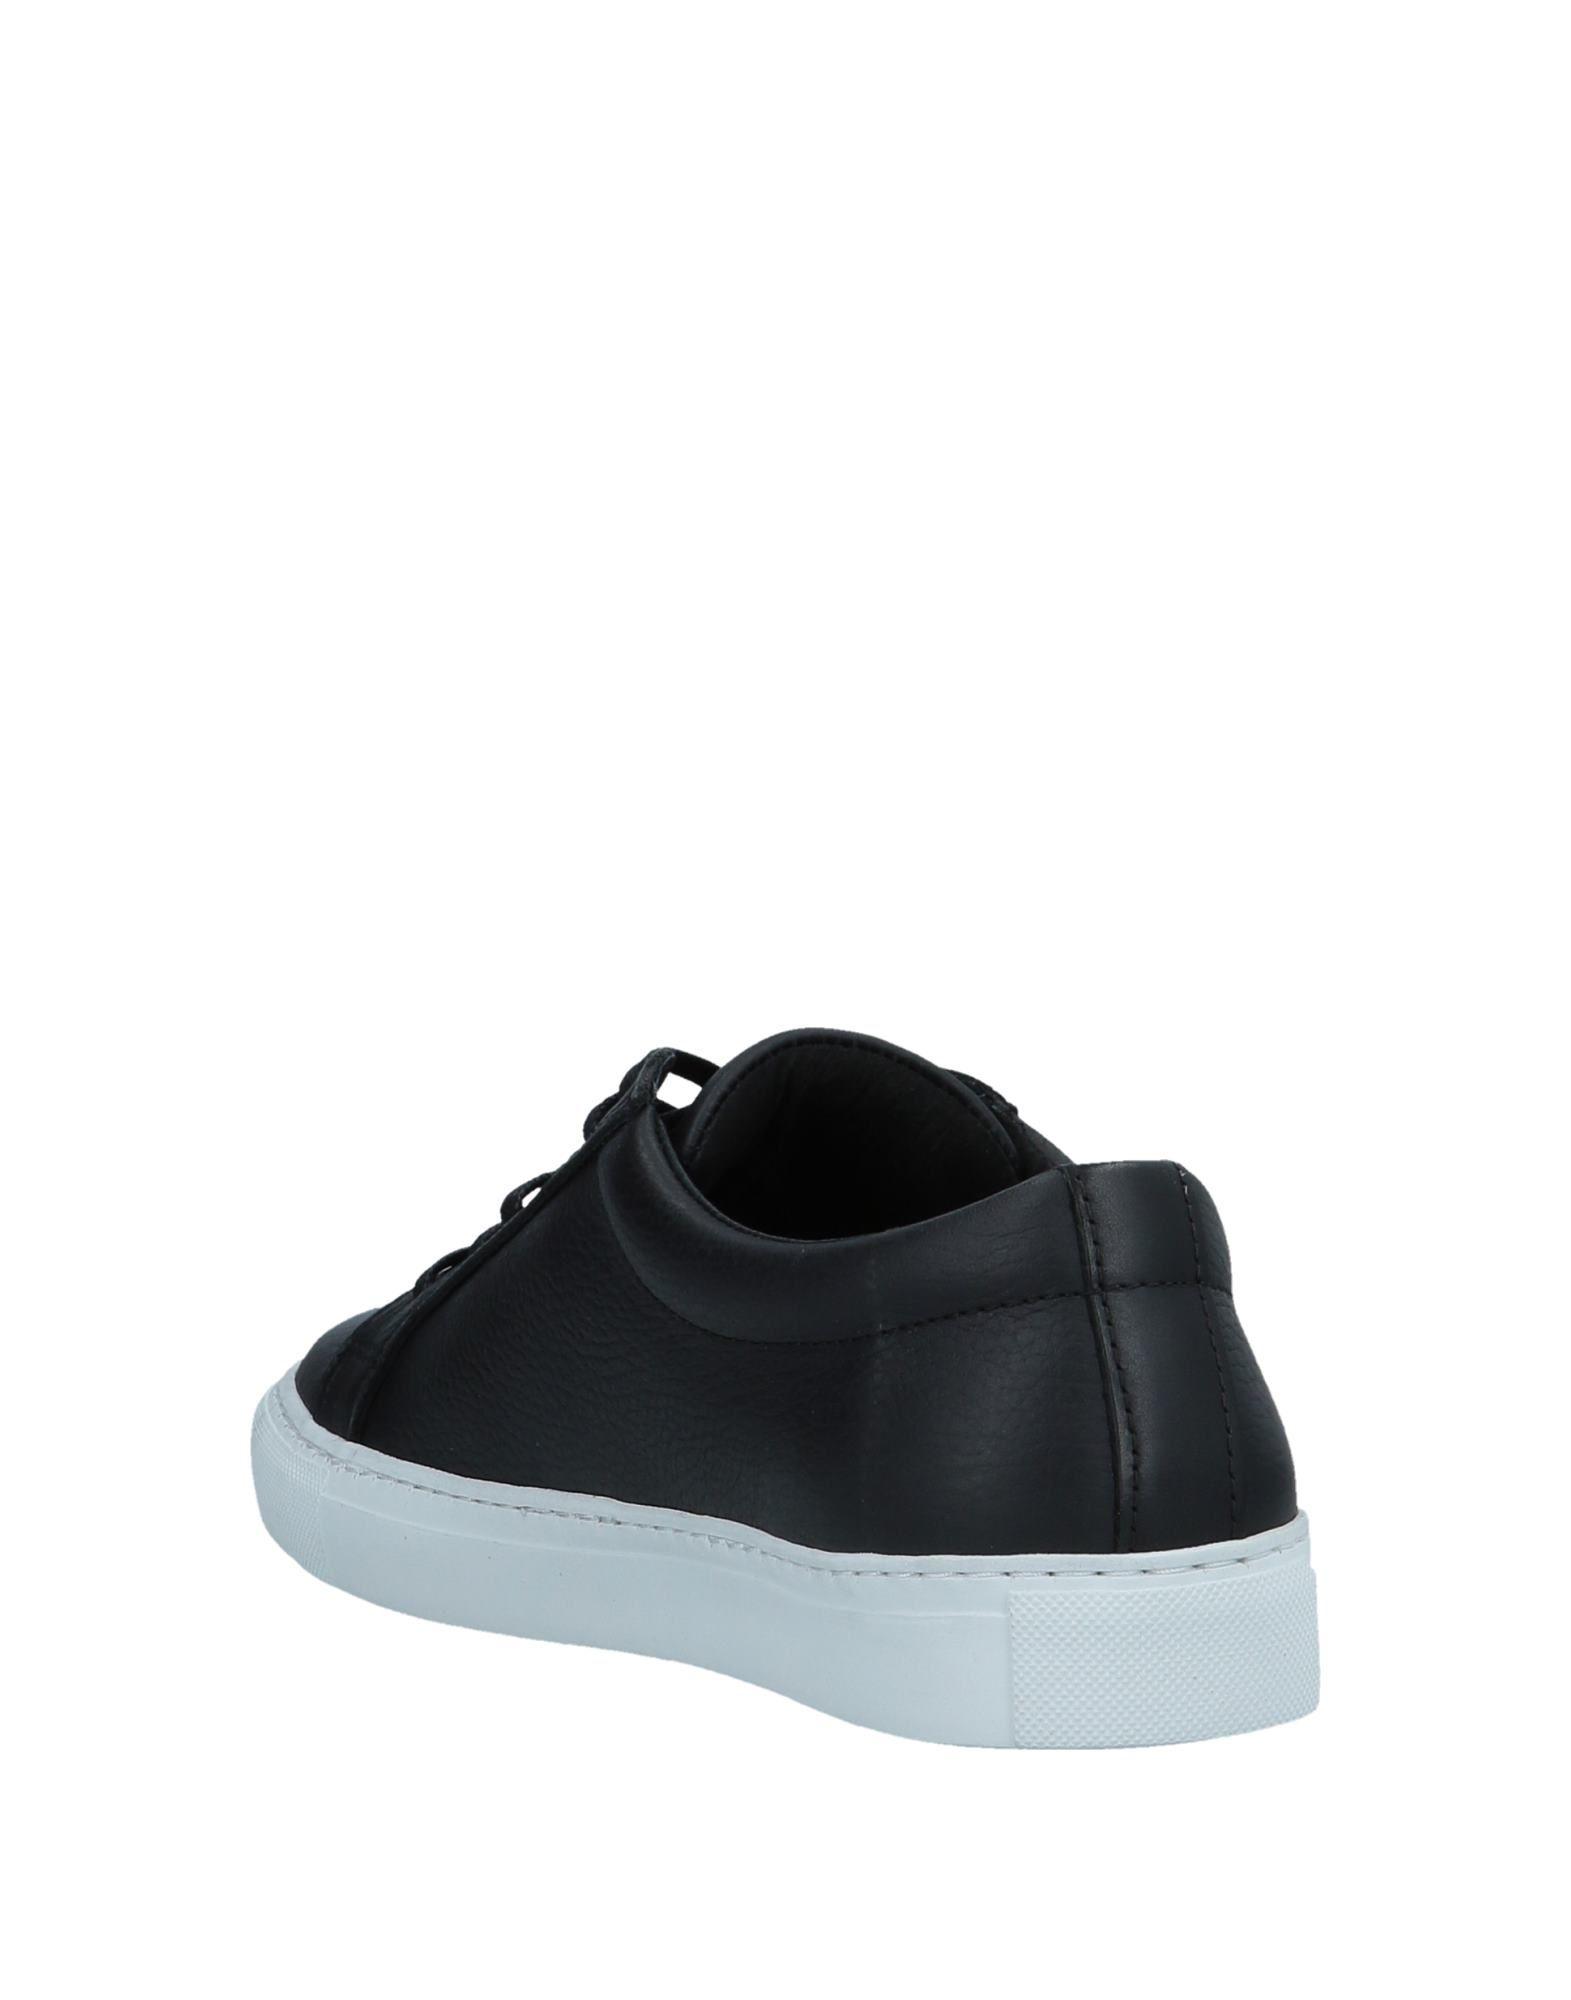 Sneakers Uomo Legends Uomo Sneakers - 11561025IA elegante b80a6a